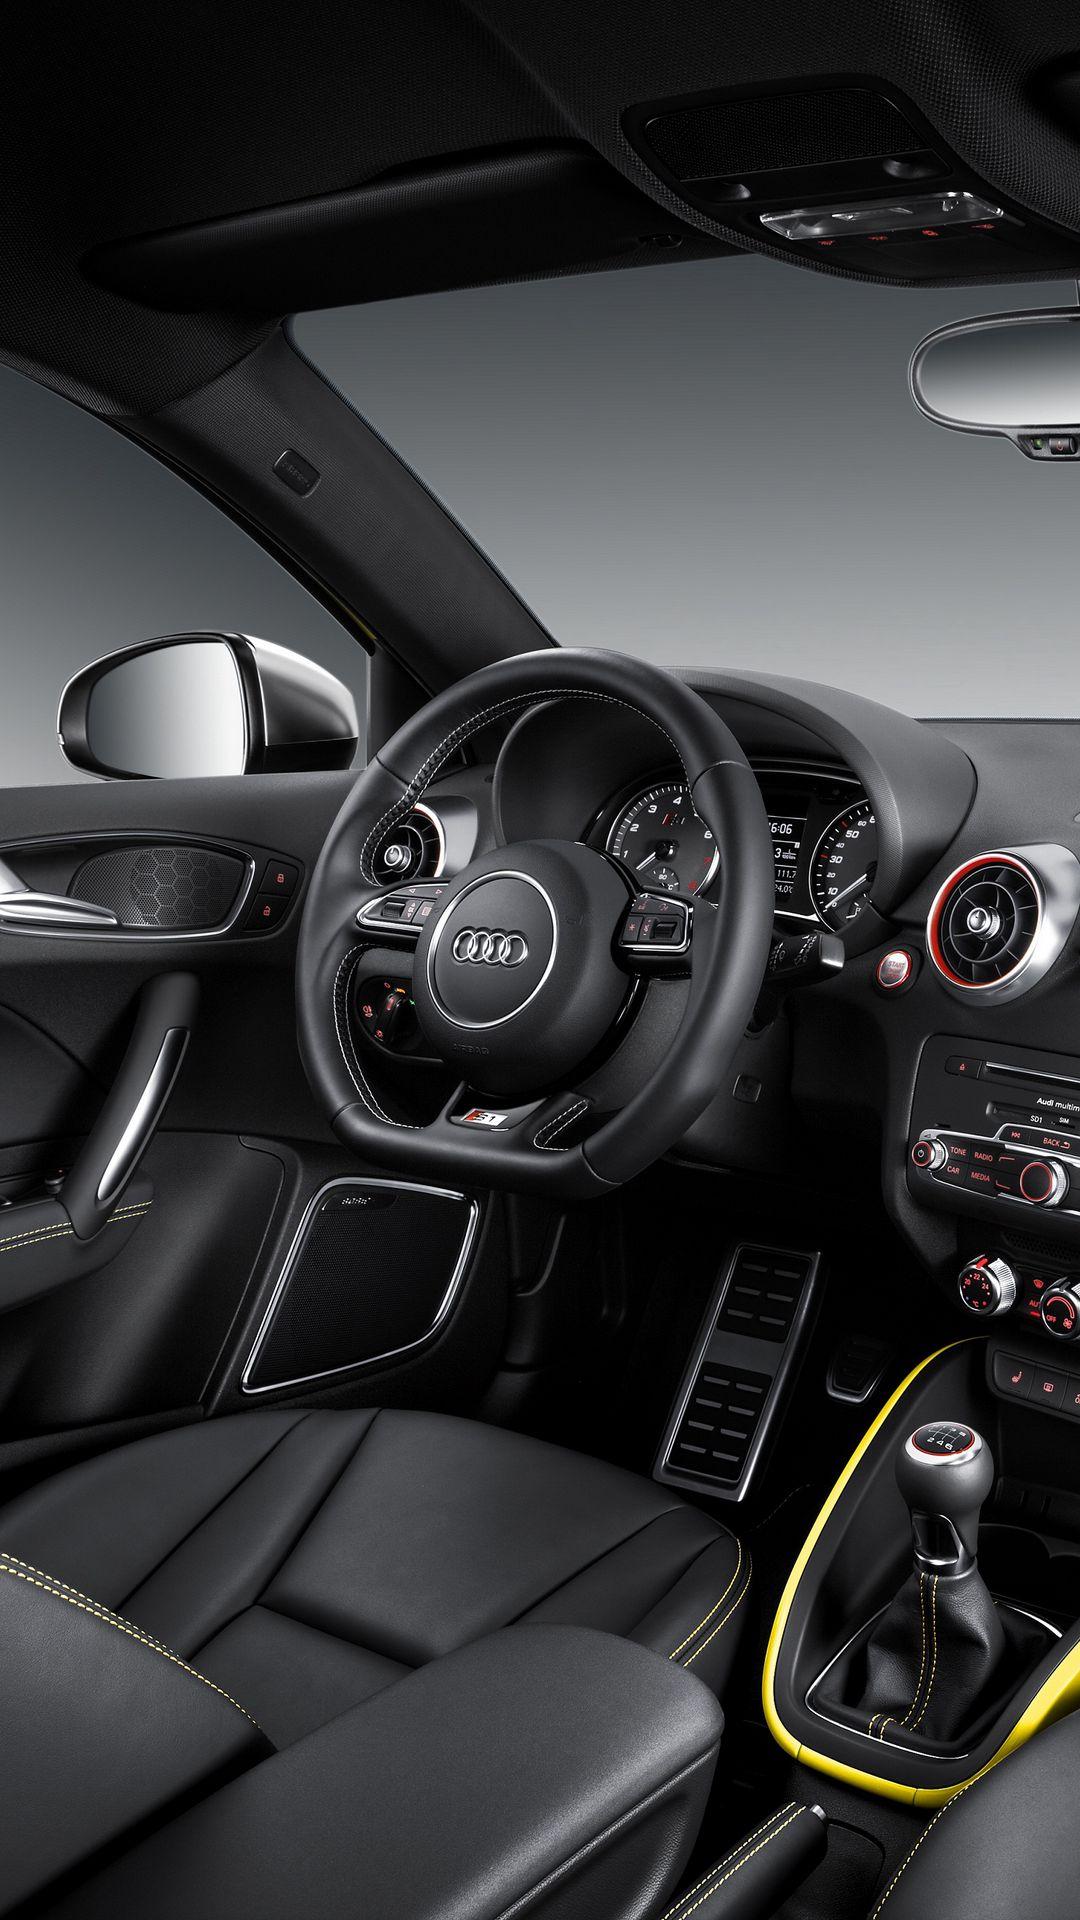 Audi Wheel Wallpapers Free Download